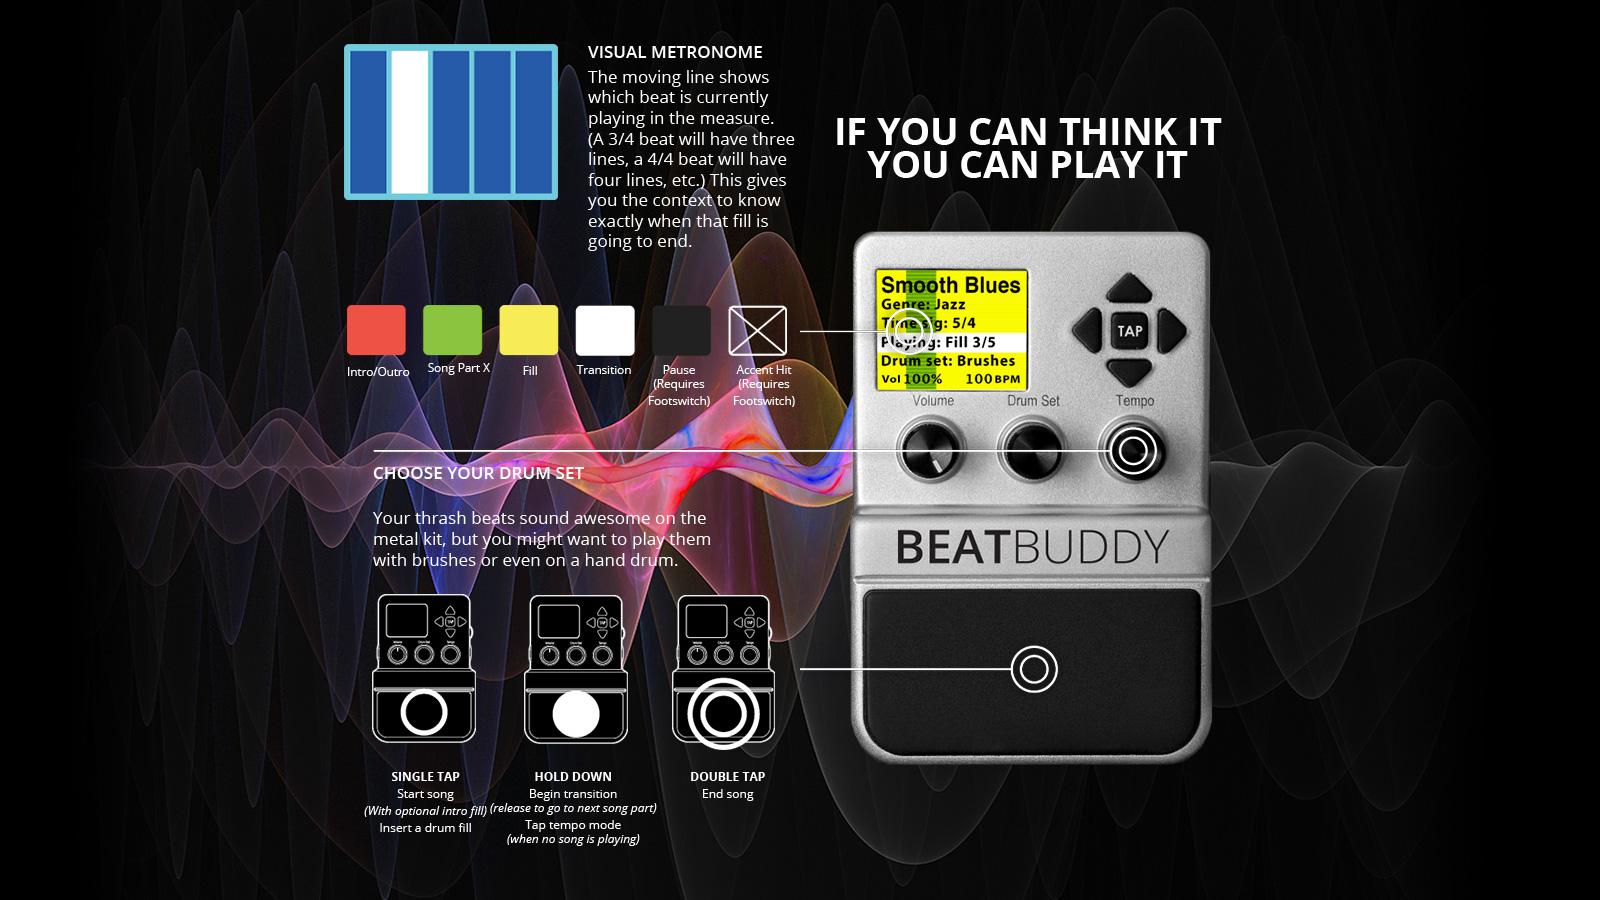 BeatBuddy explication couleur led